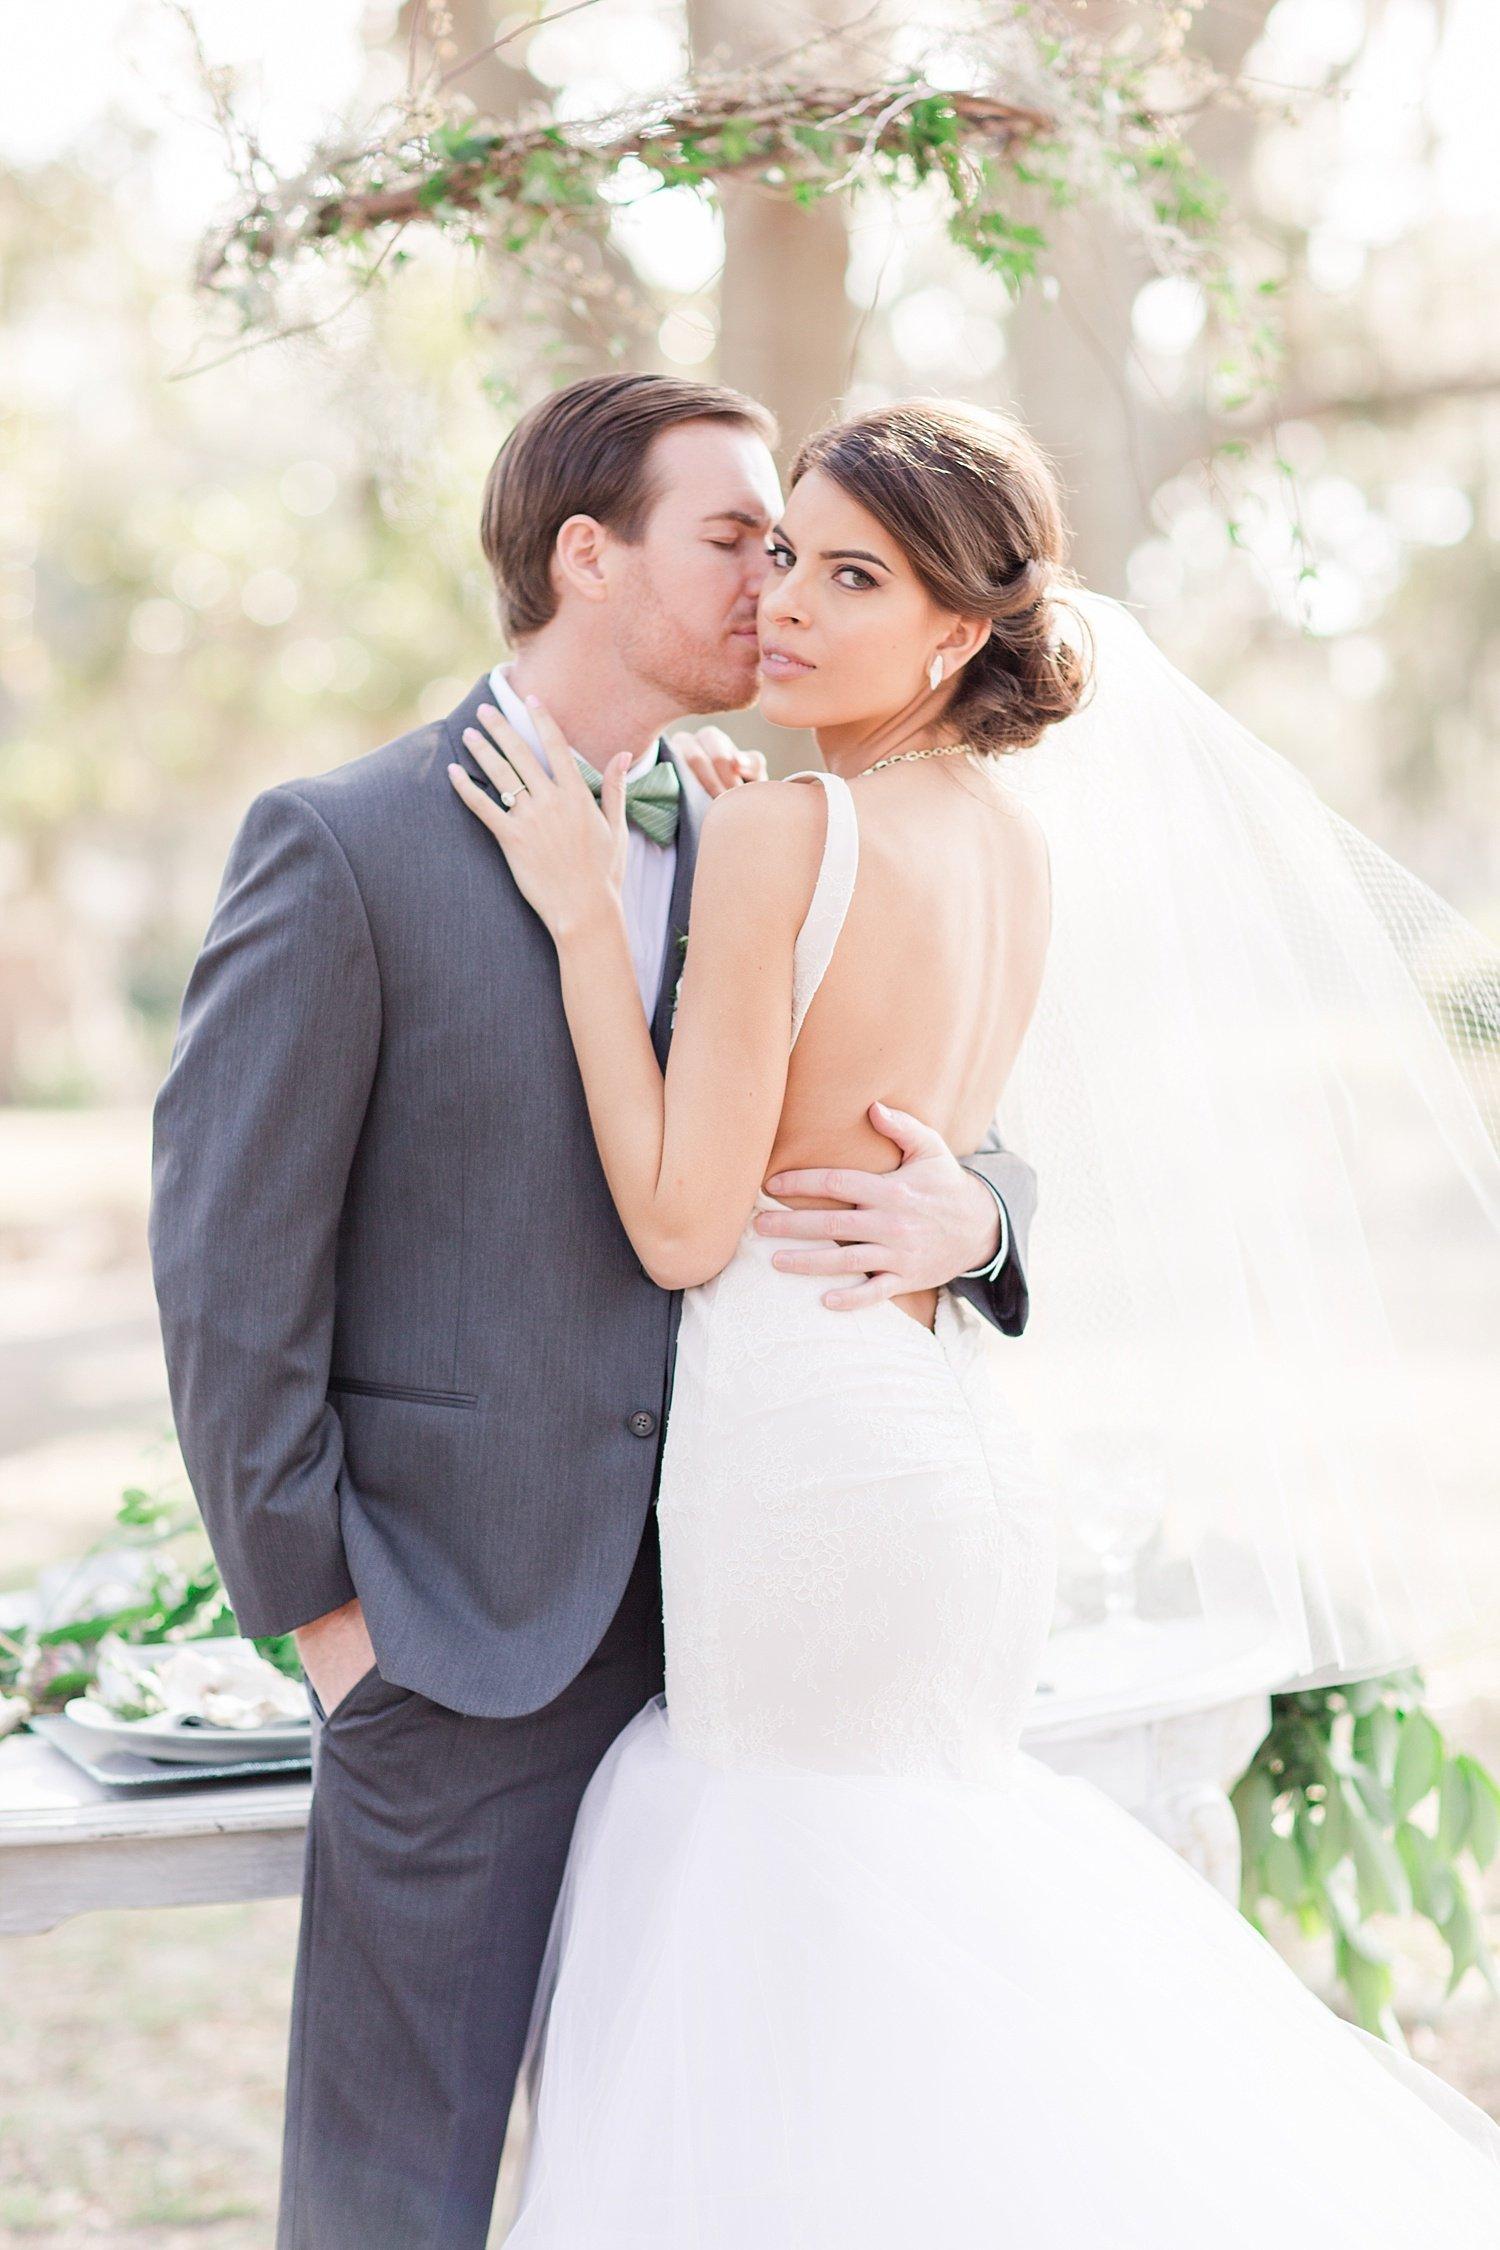 rachel-strickland-photography-katie-may-ivory-and-beau-bridal-boutique-bethesda-academy-wedding-whitfield-chapel-wedding-savannah-bridal-boutique-savannah-weddings-savannah-wedding-savannah-wedding-planner-savannah-bridal-gowns-savannah-bride-7.jpg